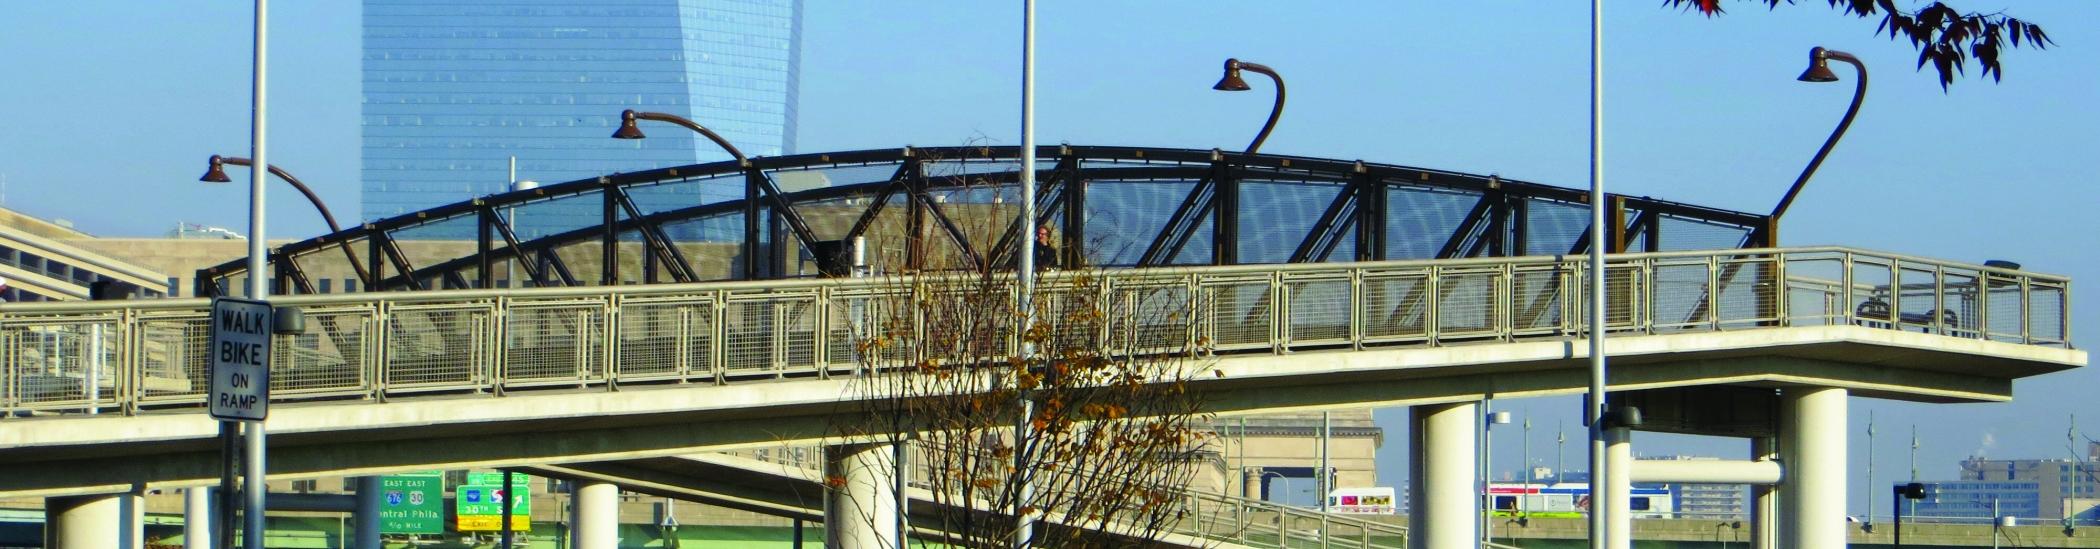 bridge to Schuylkill Banks in Philadelphia